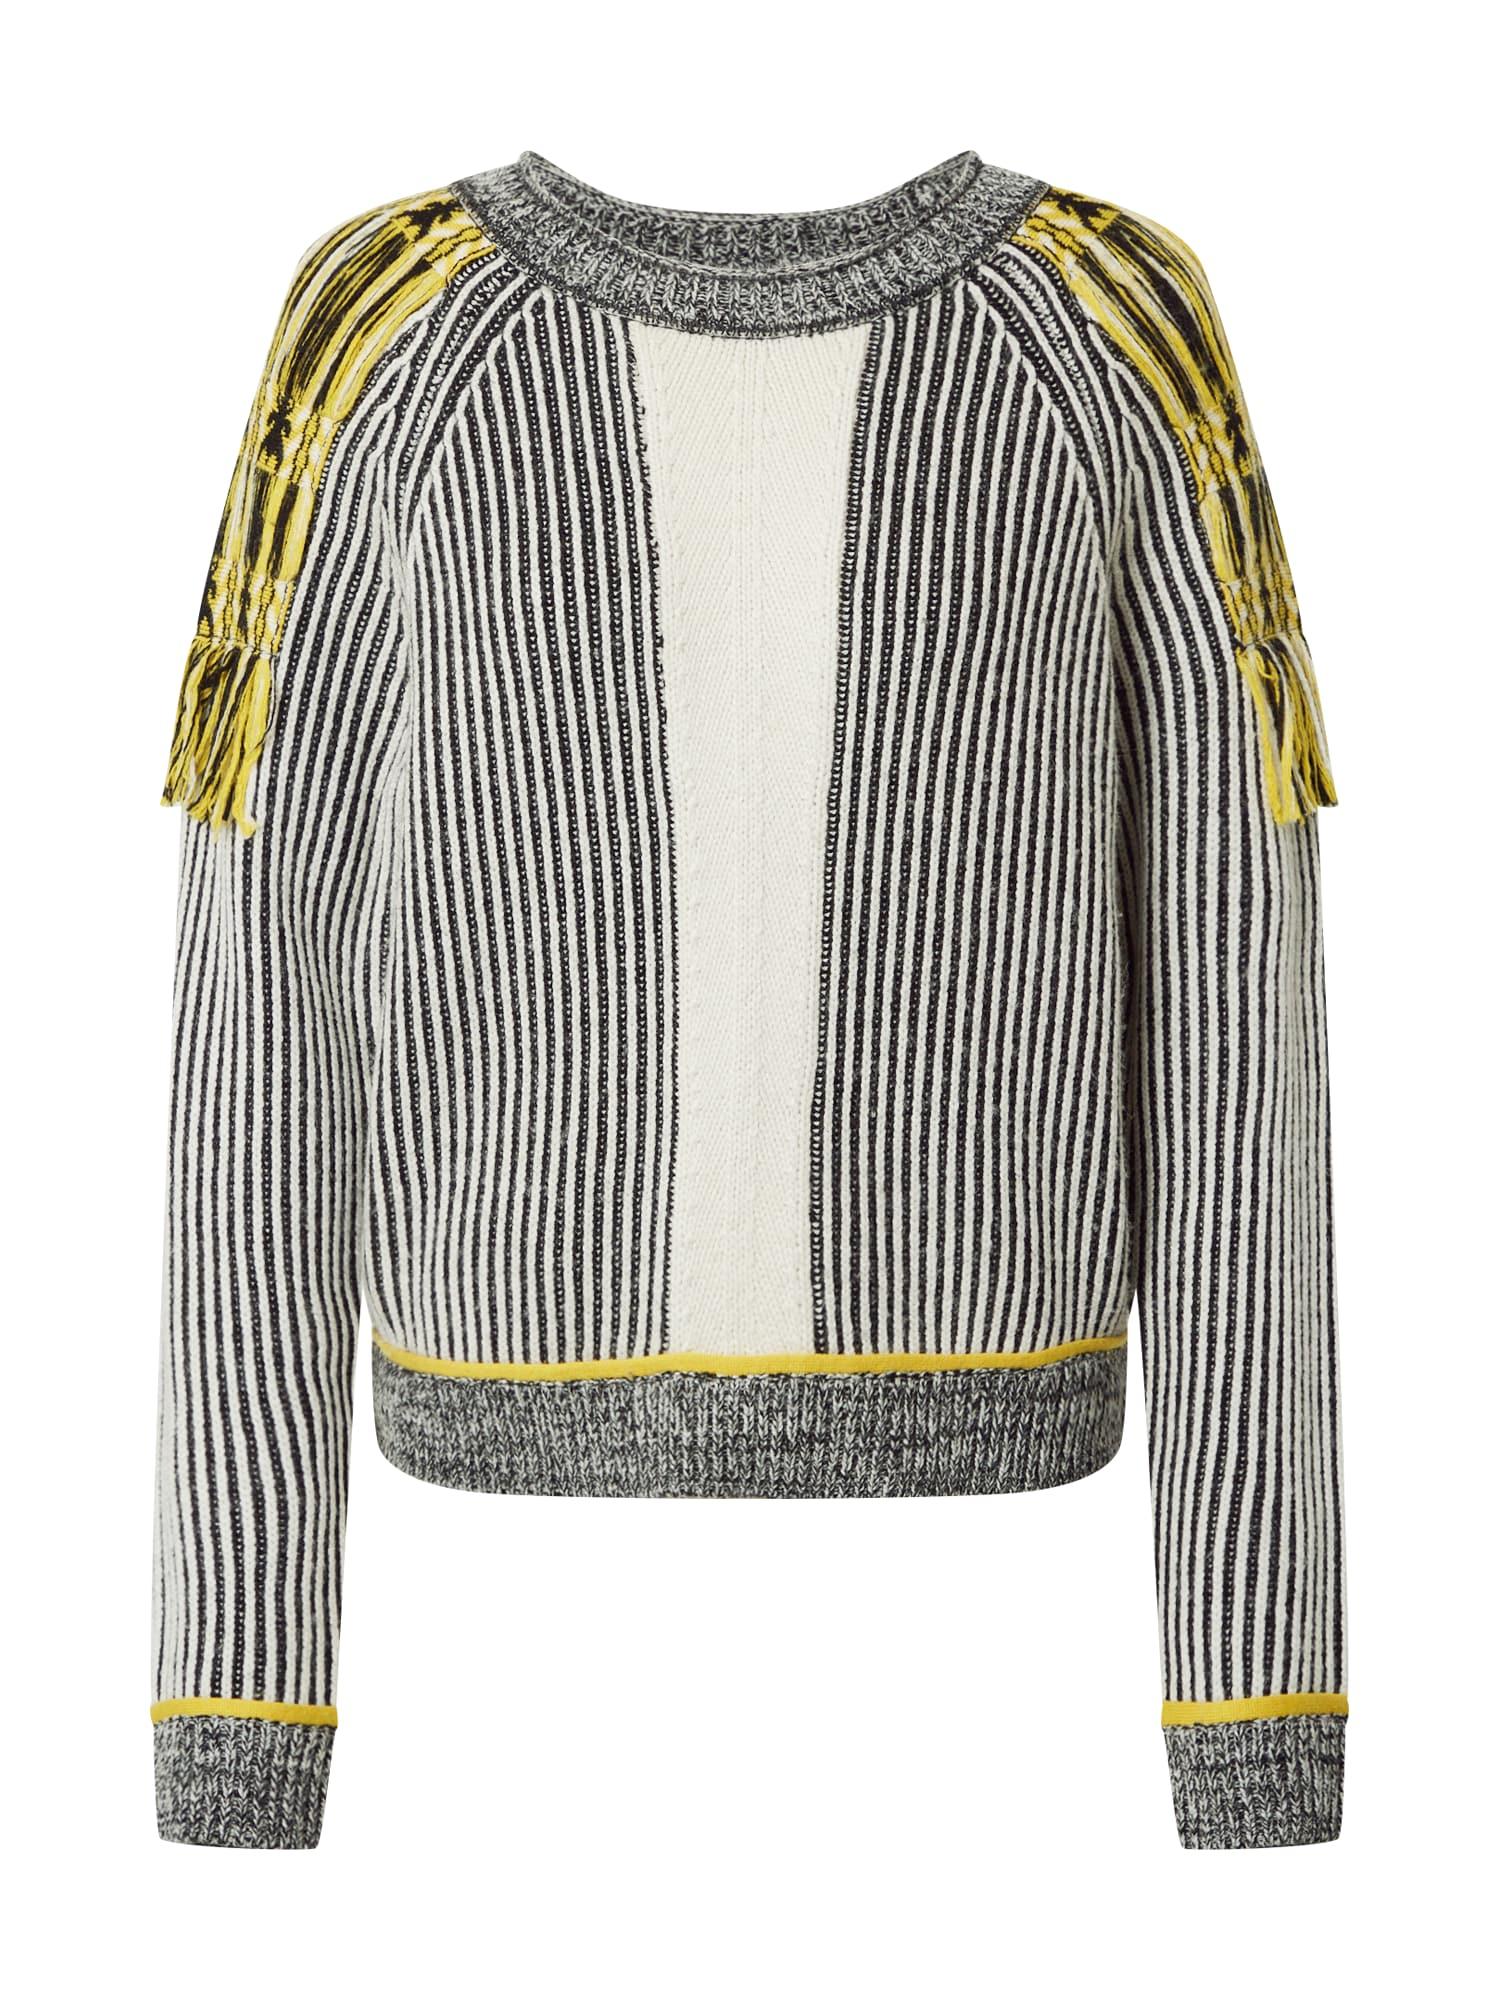 PATRIZIA PEPE Megztinis geltona / balta / juoda